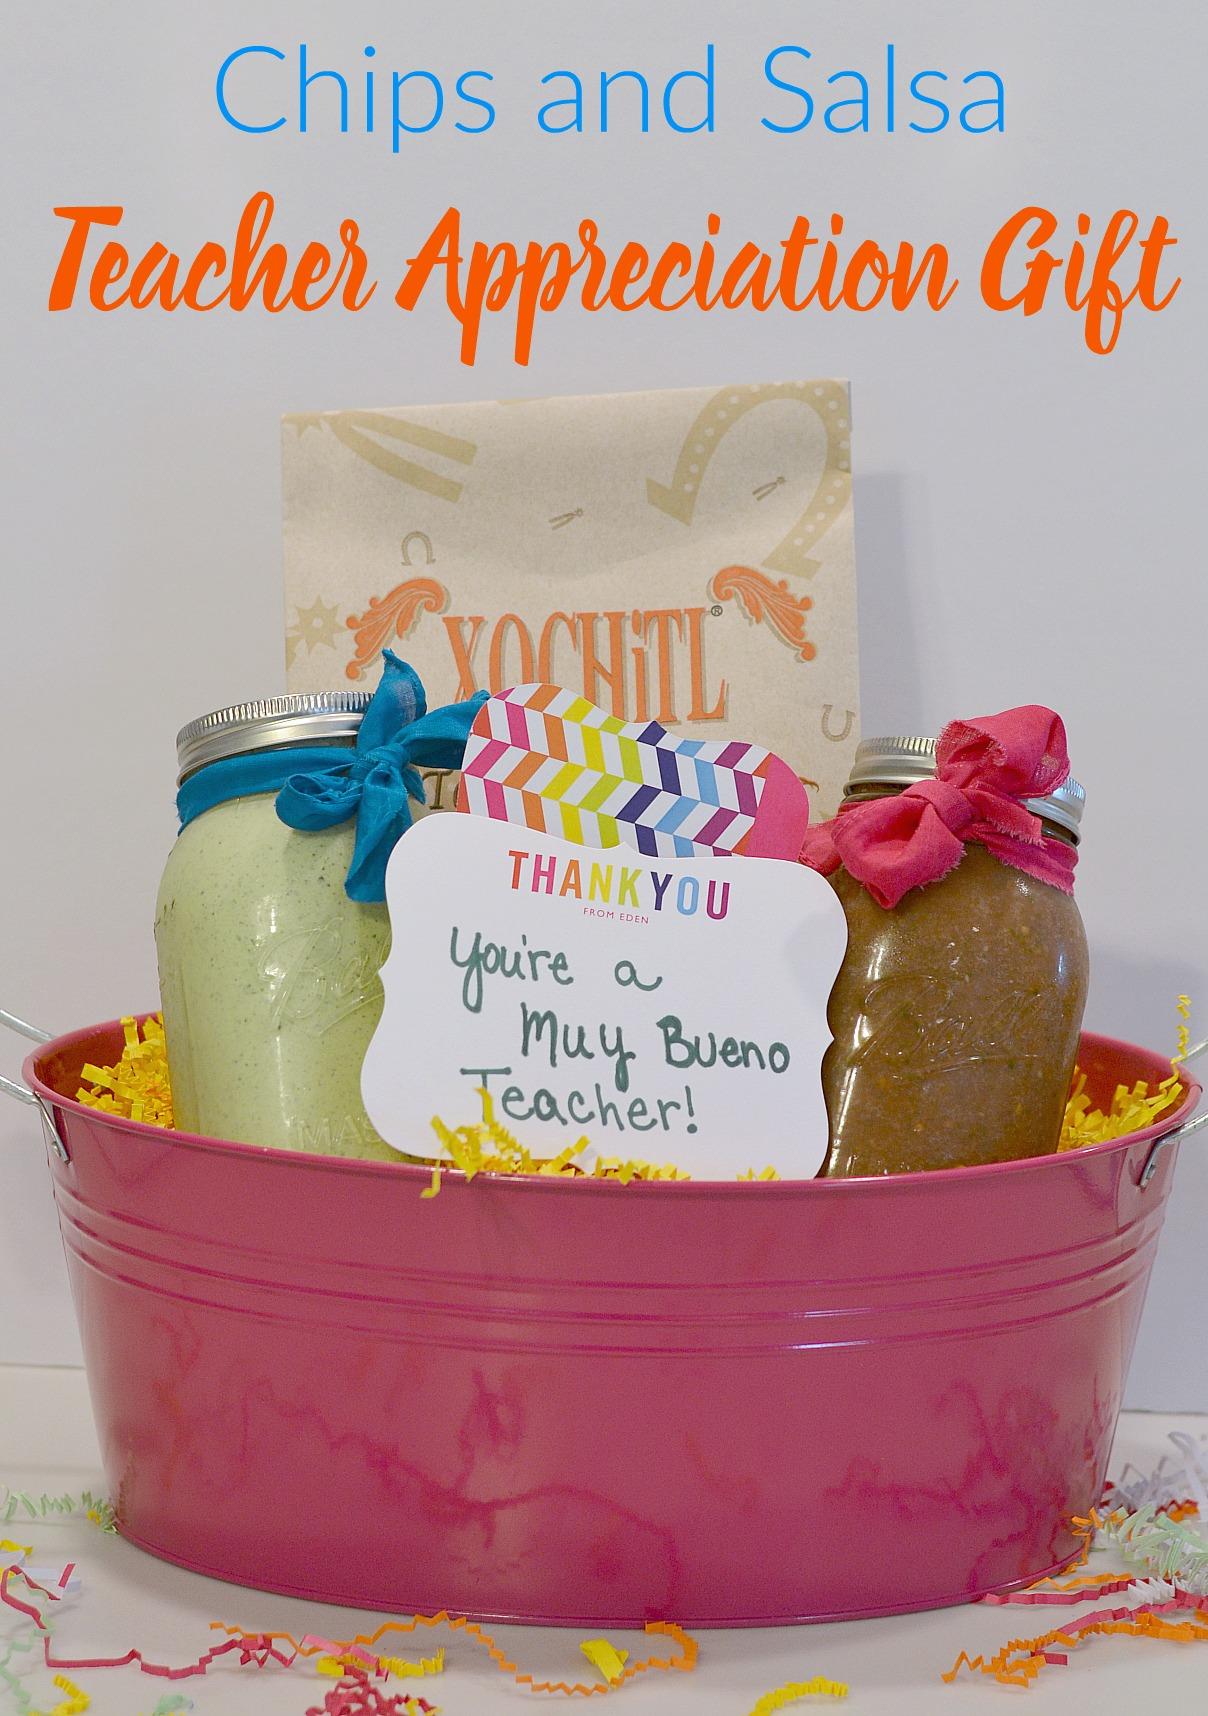 Chips and Salsa Teacher Appreciation Gift